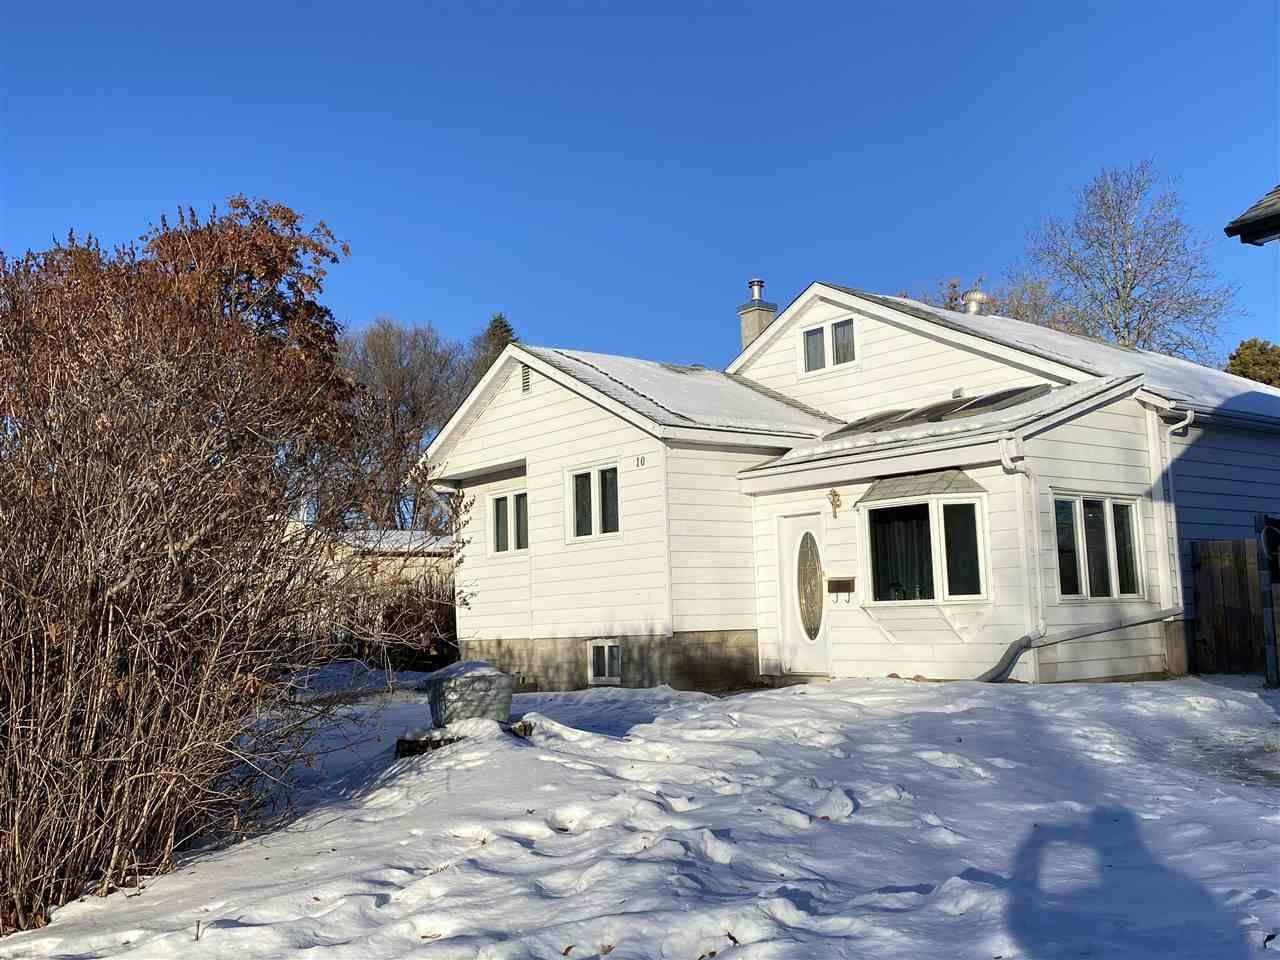 Main Photo: 10 KOOTENAY Avenue: Devon House for sale : MLS®# E4225852